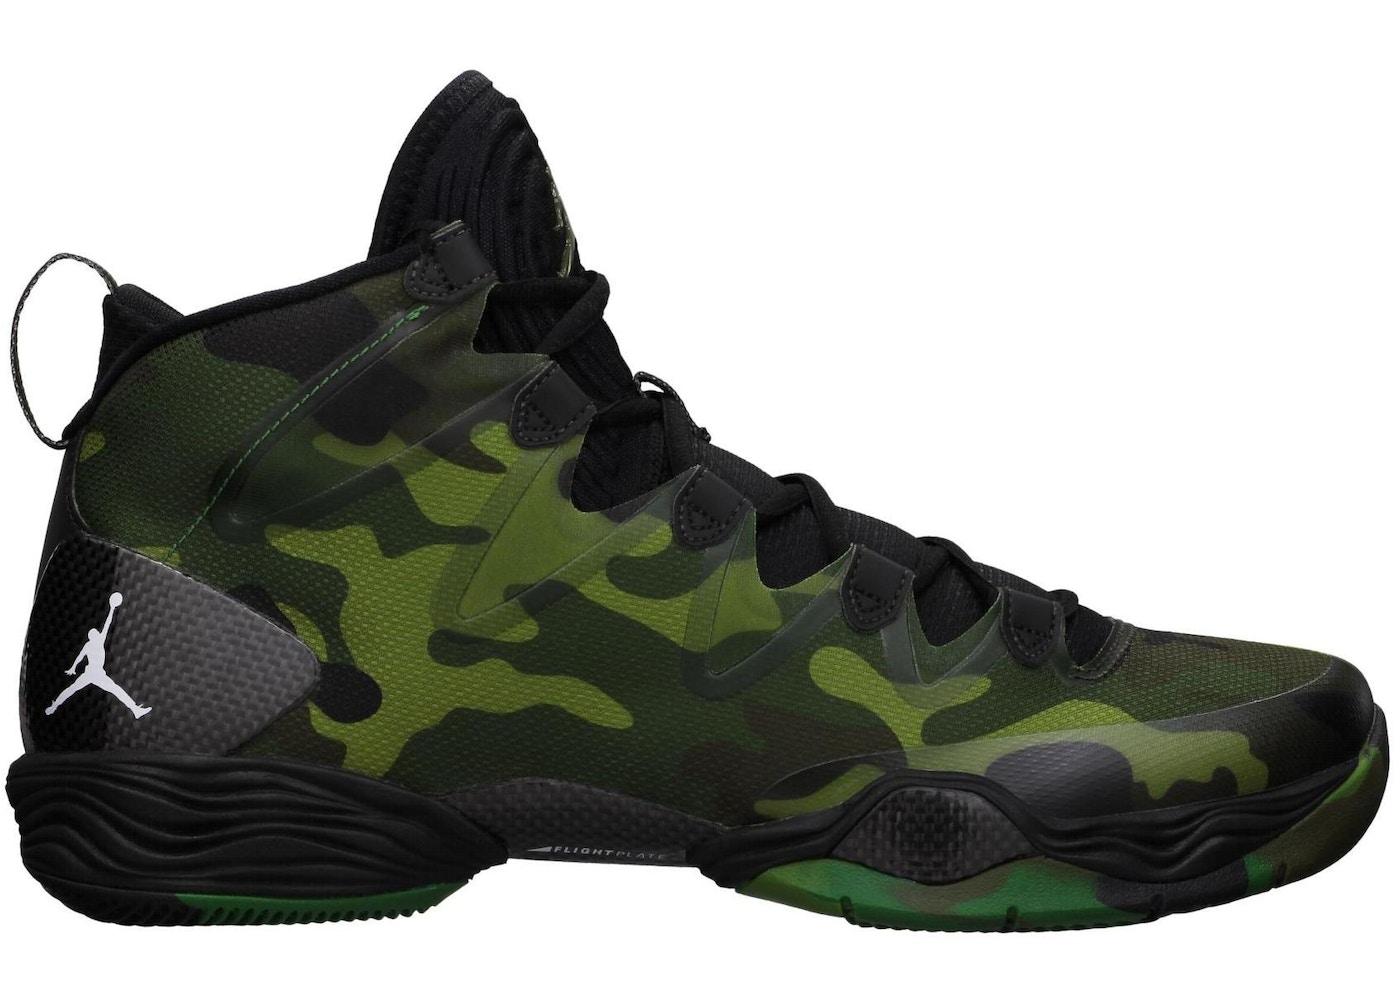 buy online af3ed 73db0 Jordan XX8 SE Green Camo